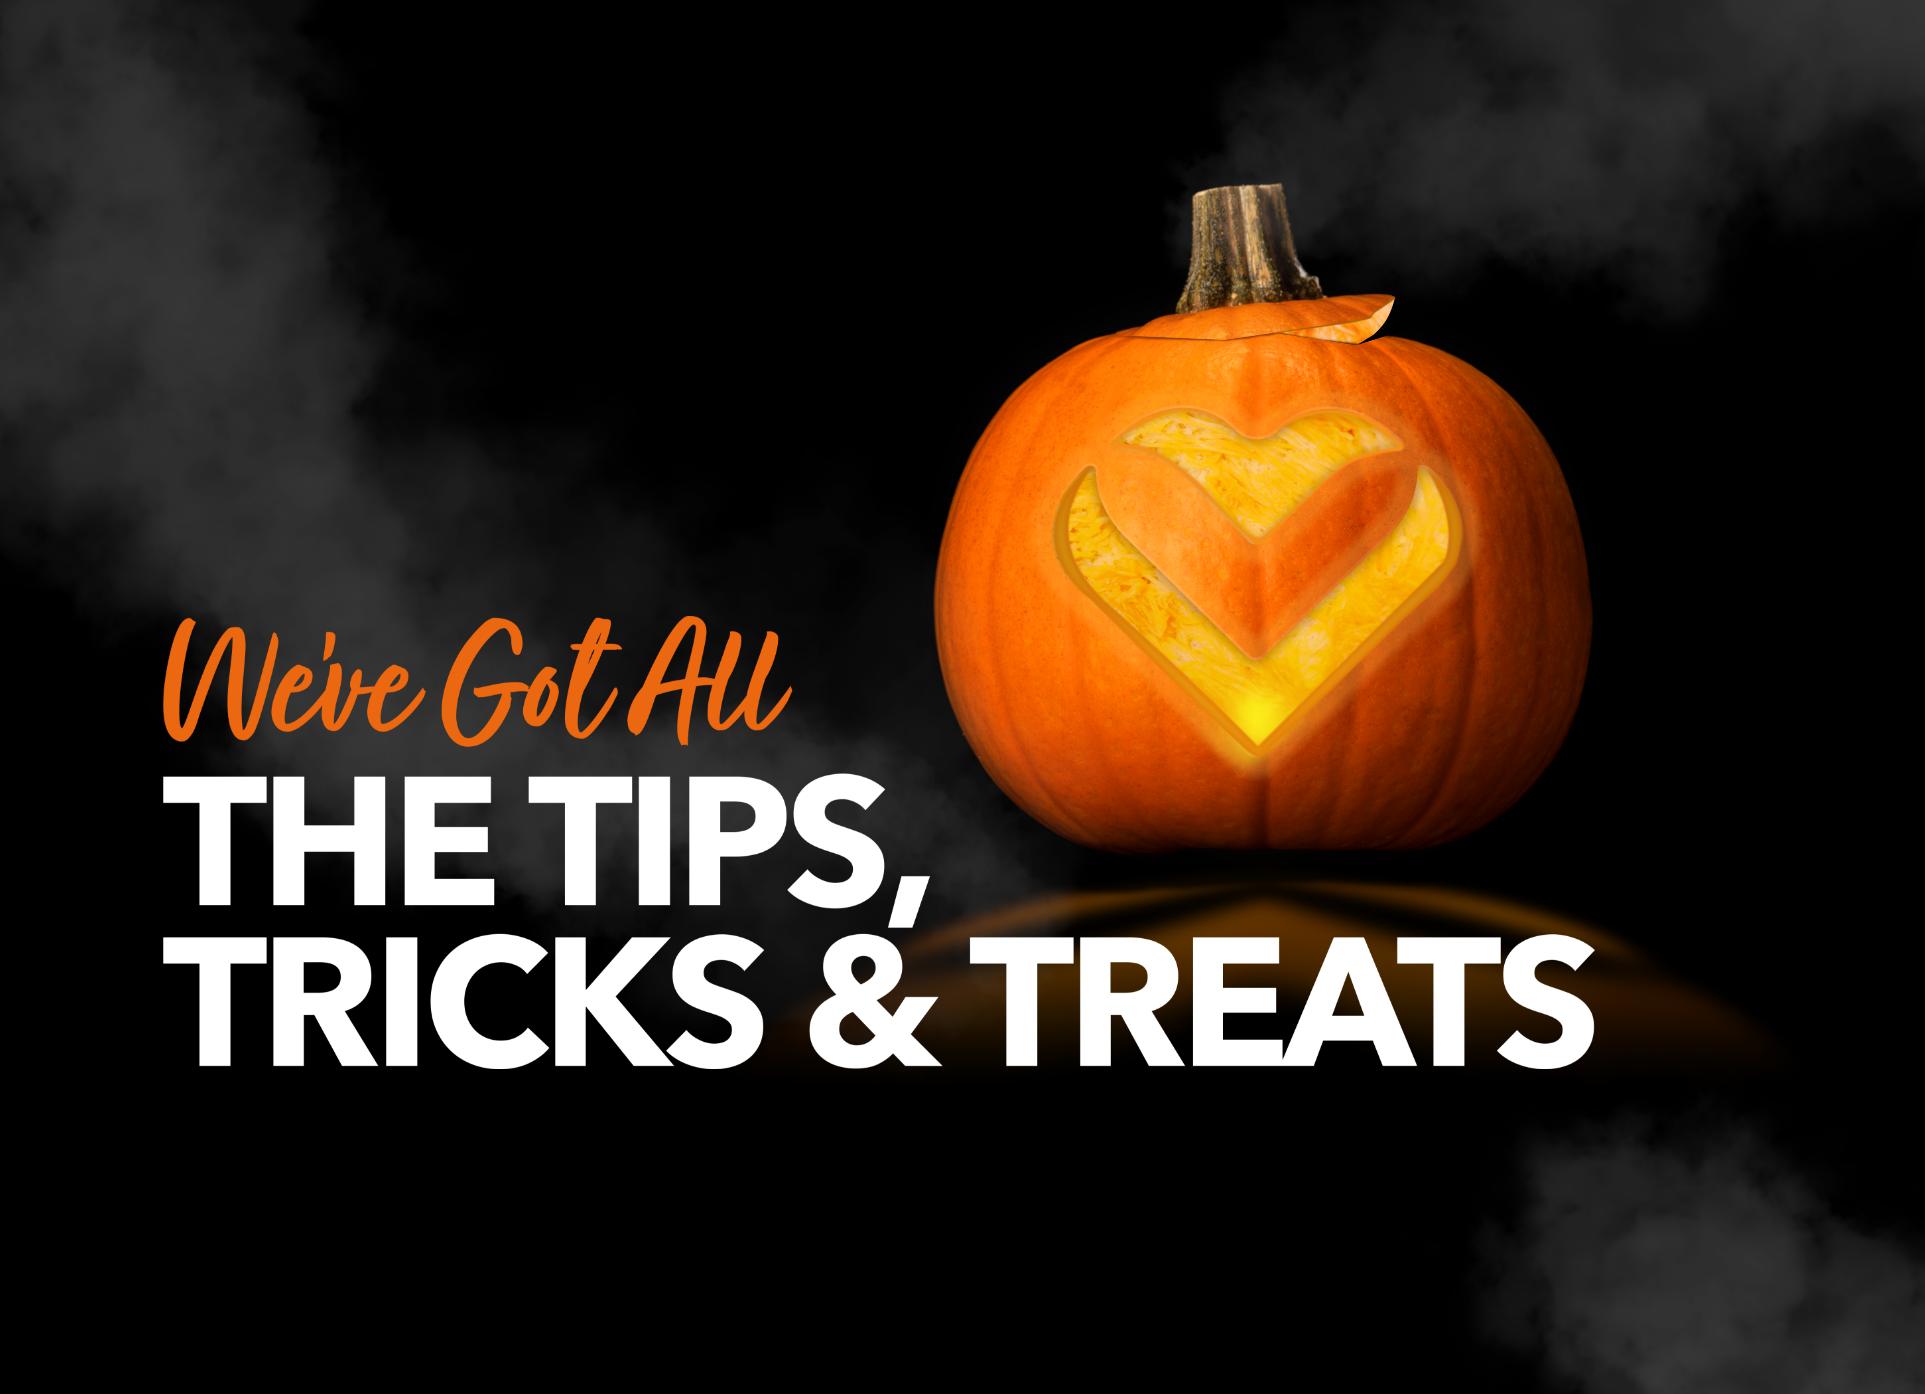 We've Got All the Tips, Tricks & Treats!